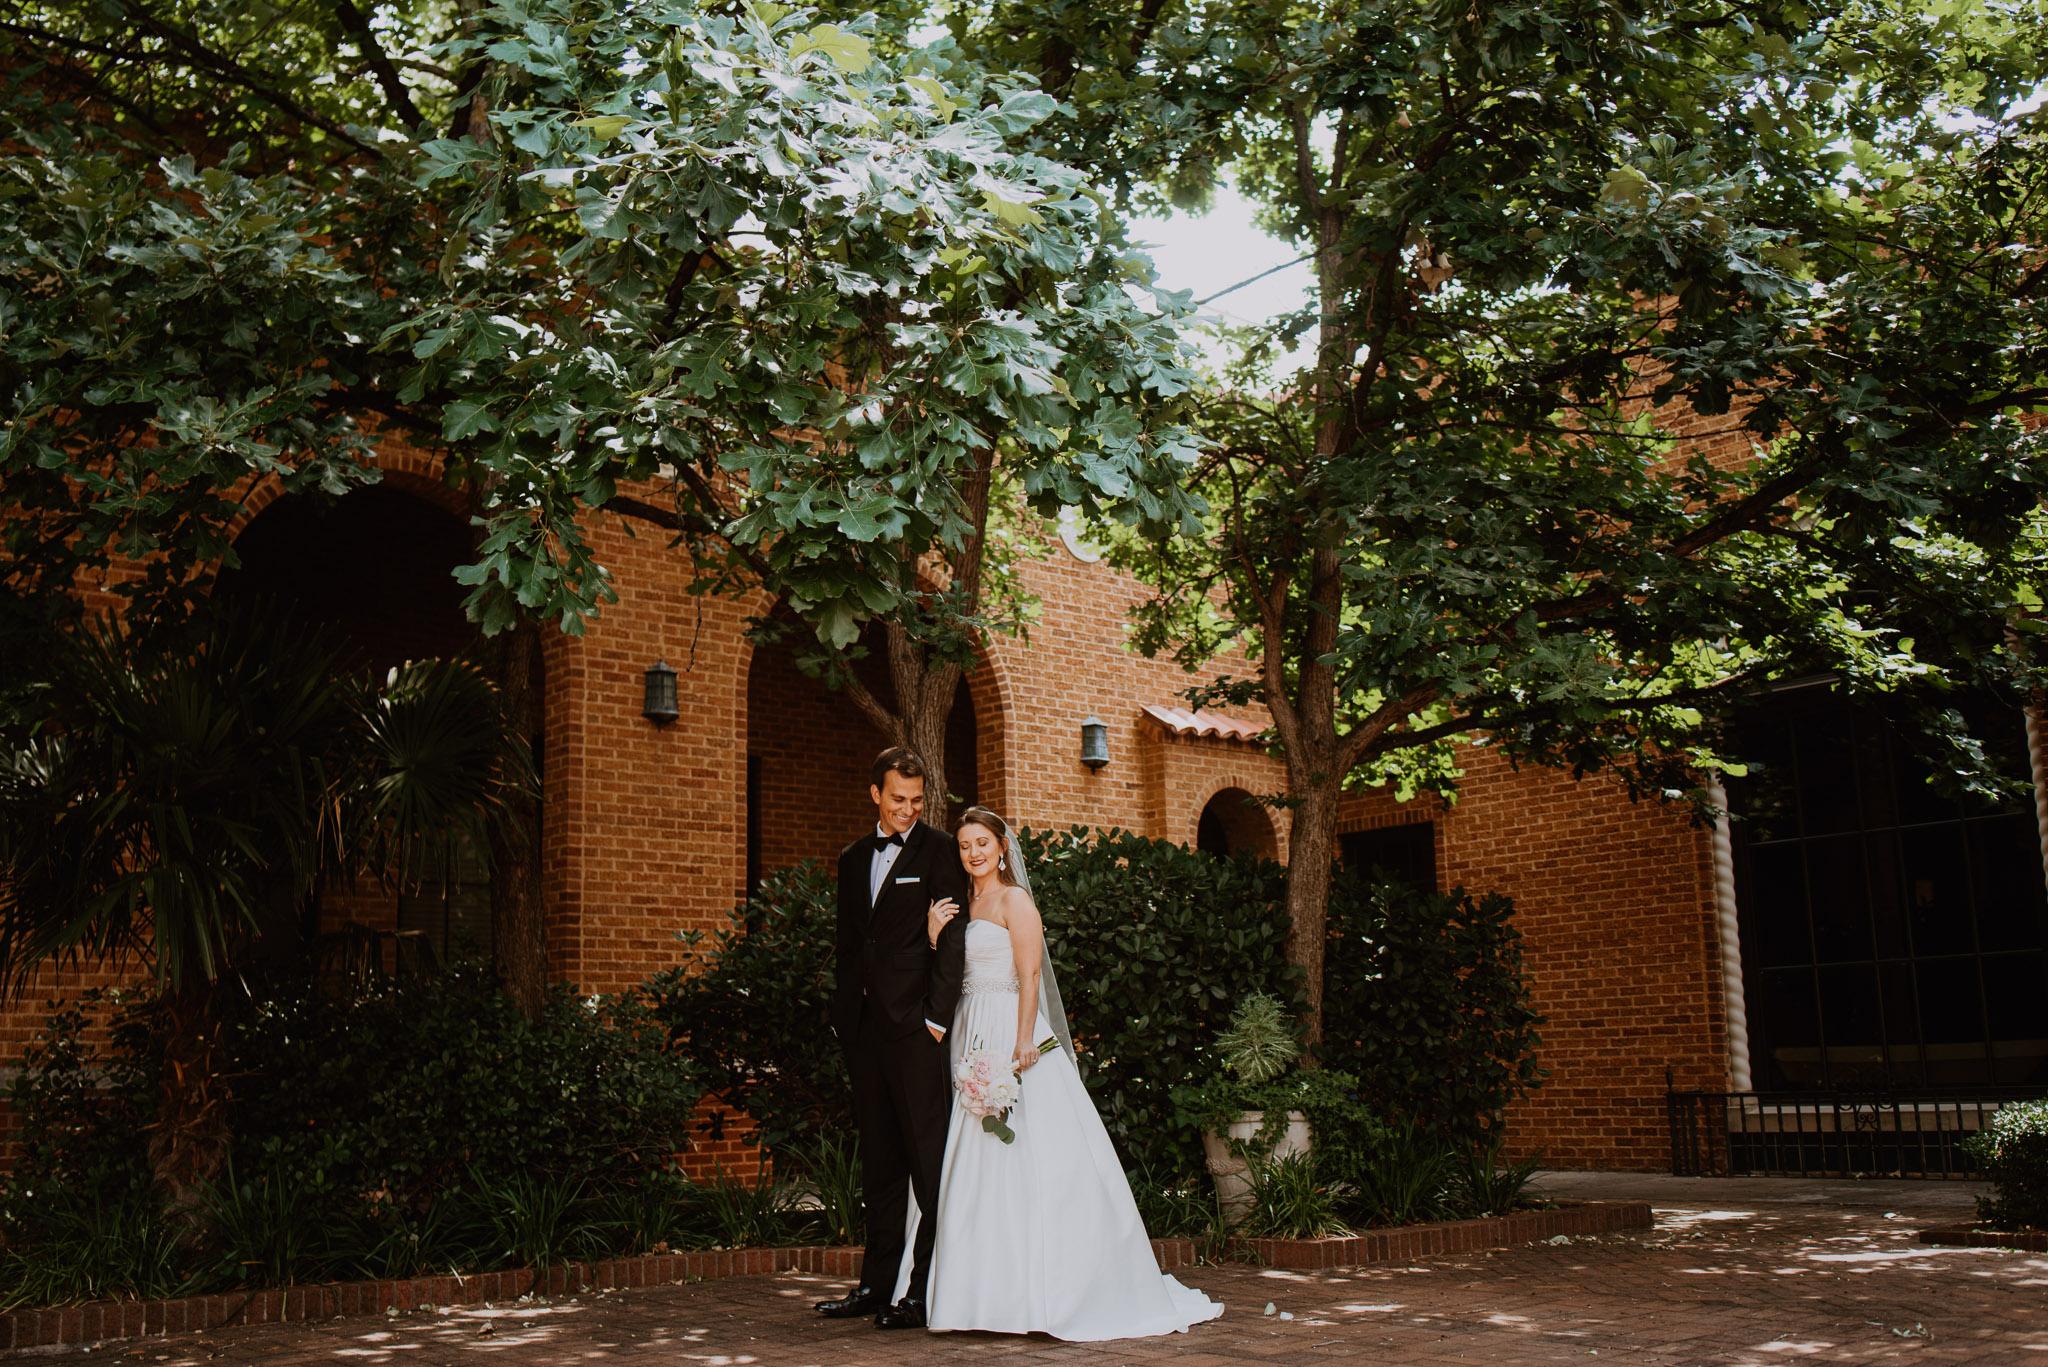 Bentwood-country-club-wedding-shea-tyson-0011.jpg